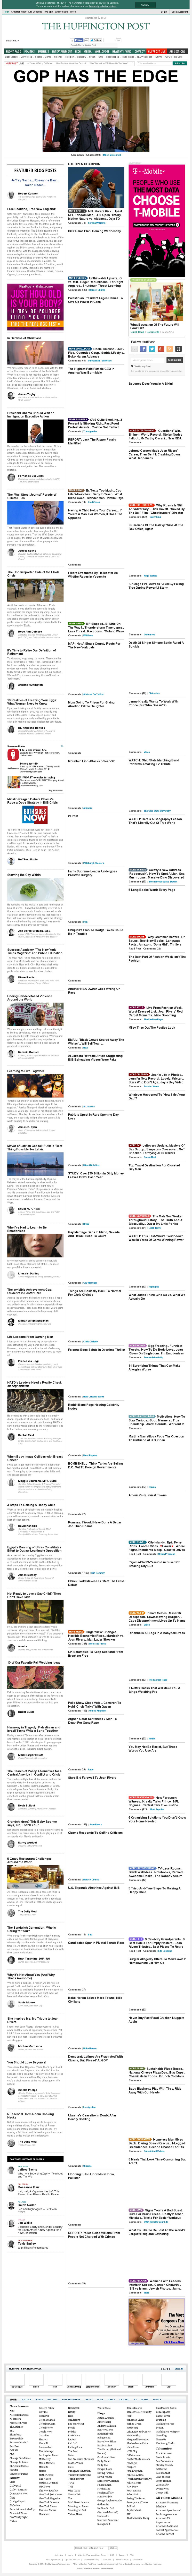 The Huffington Post at Monday Sept. 8, 2014, 6:06 a.m. UTC